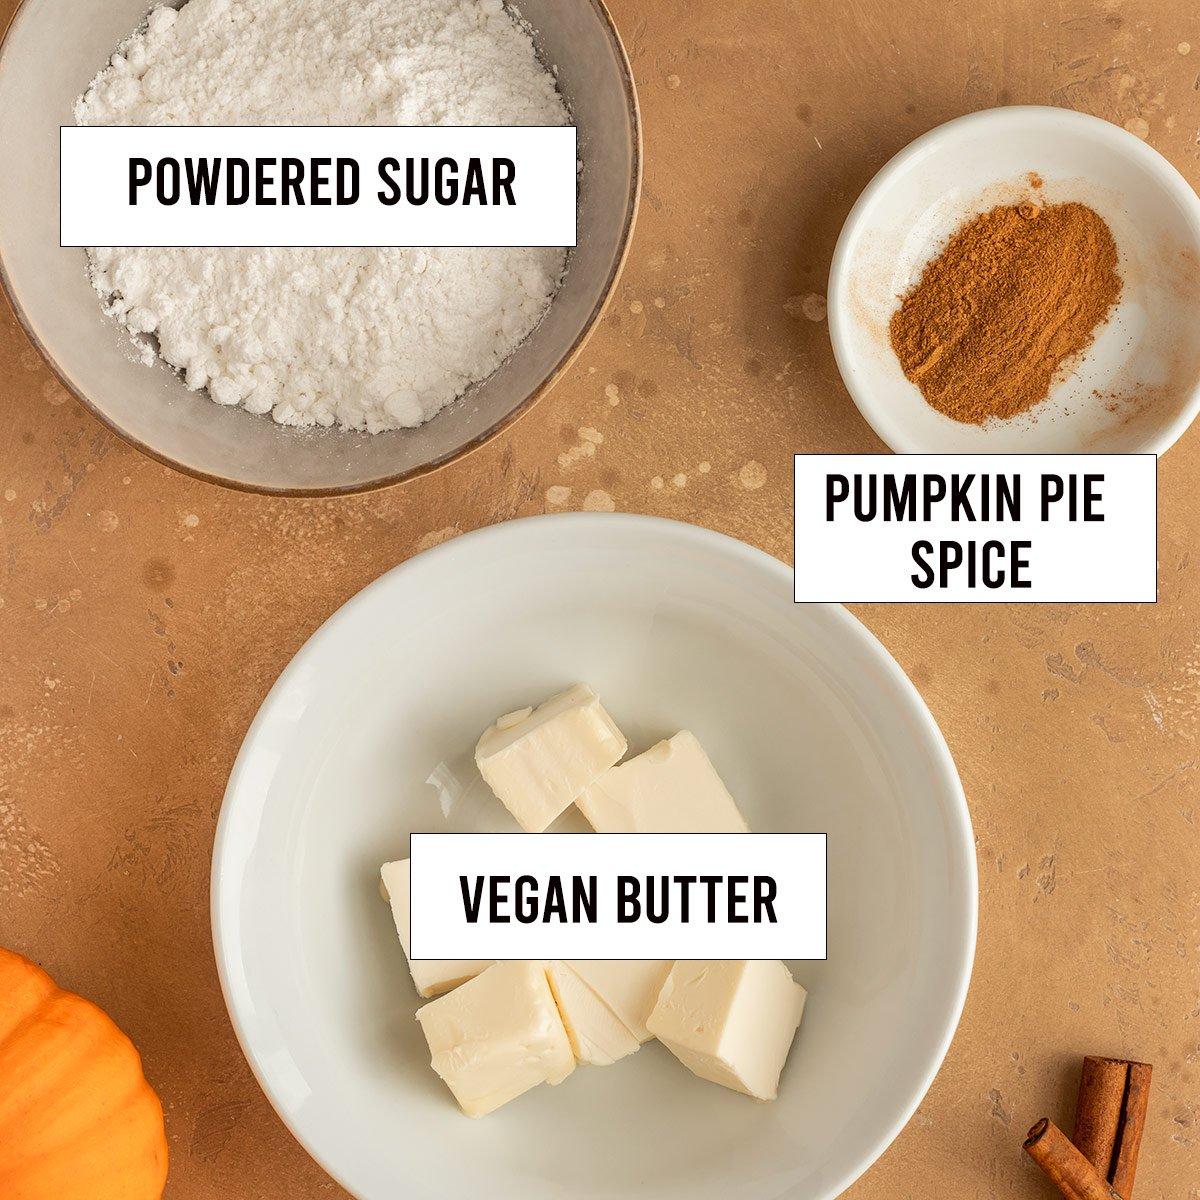 frosting ingredients labeled as vegan butter, powdered sugar, pumpkin pie spice